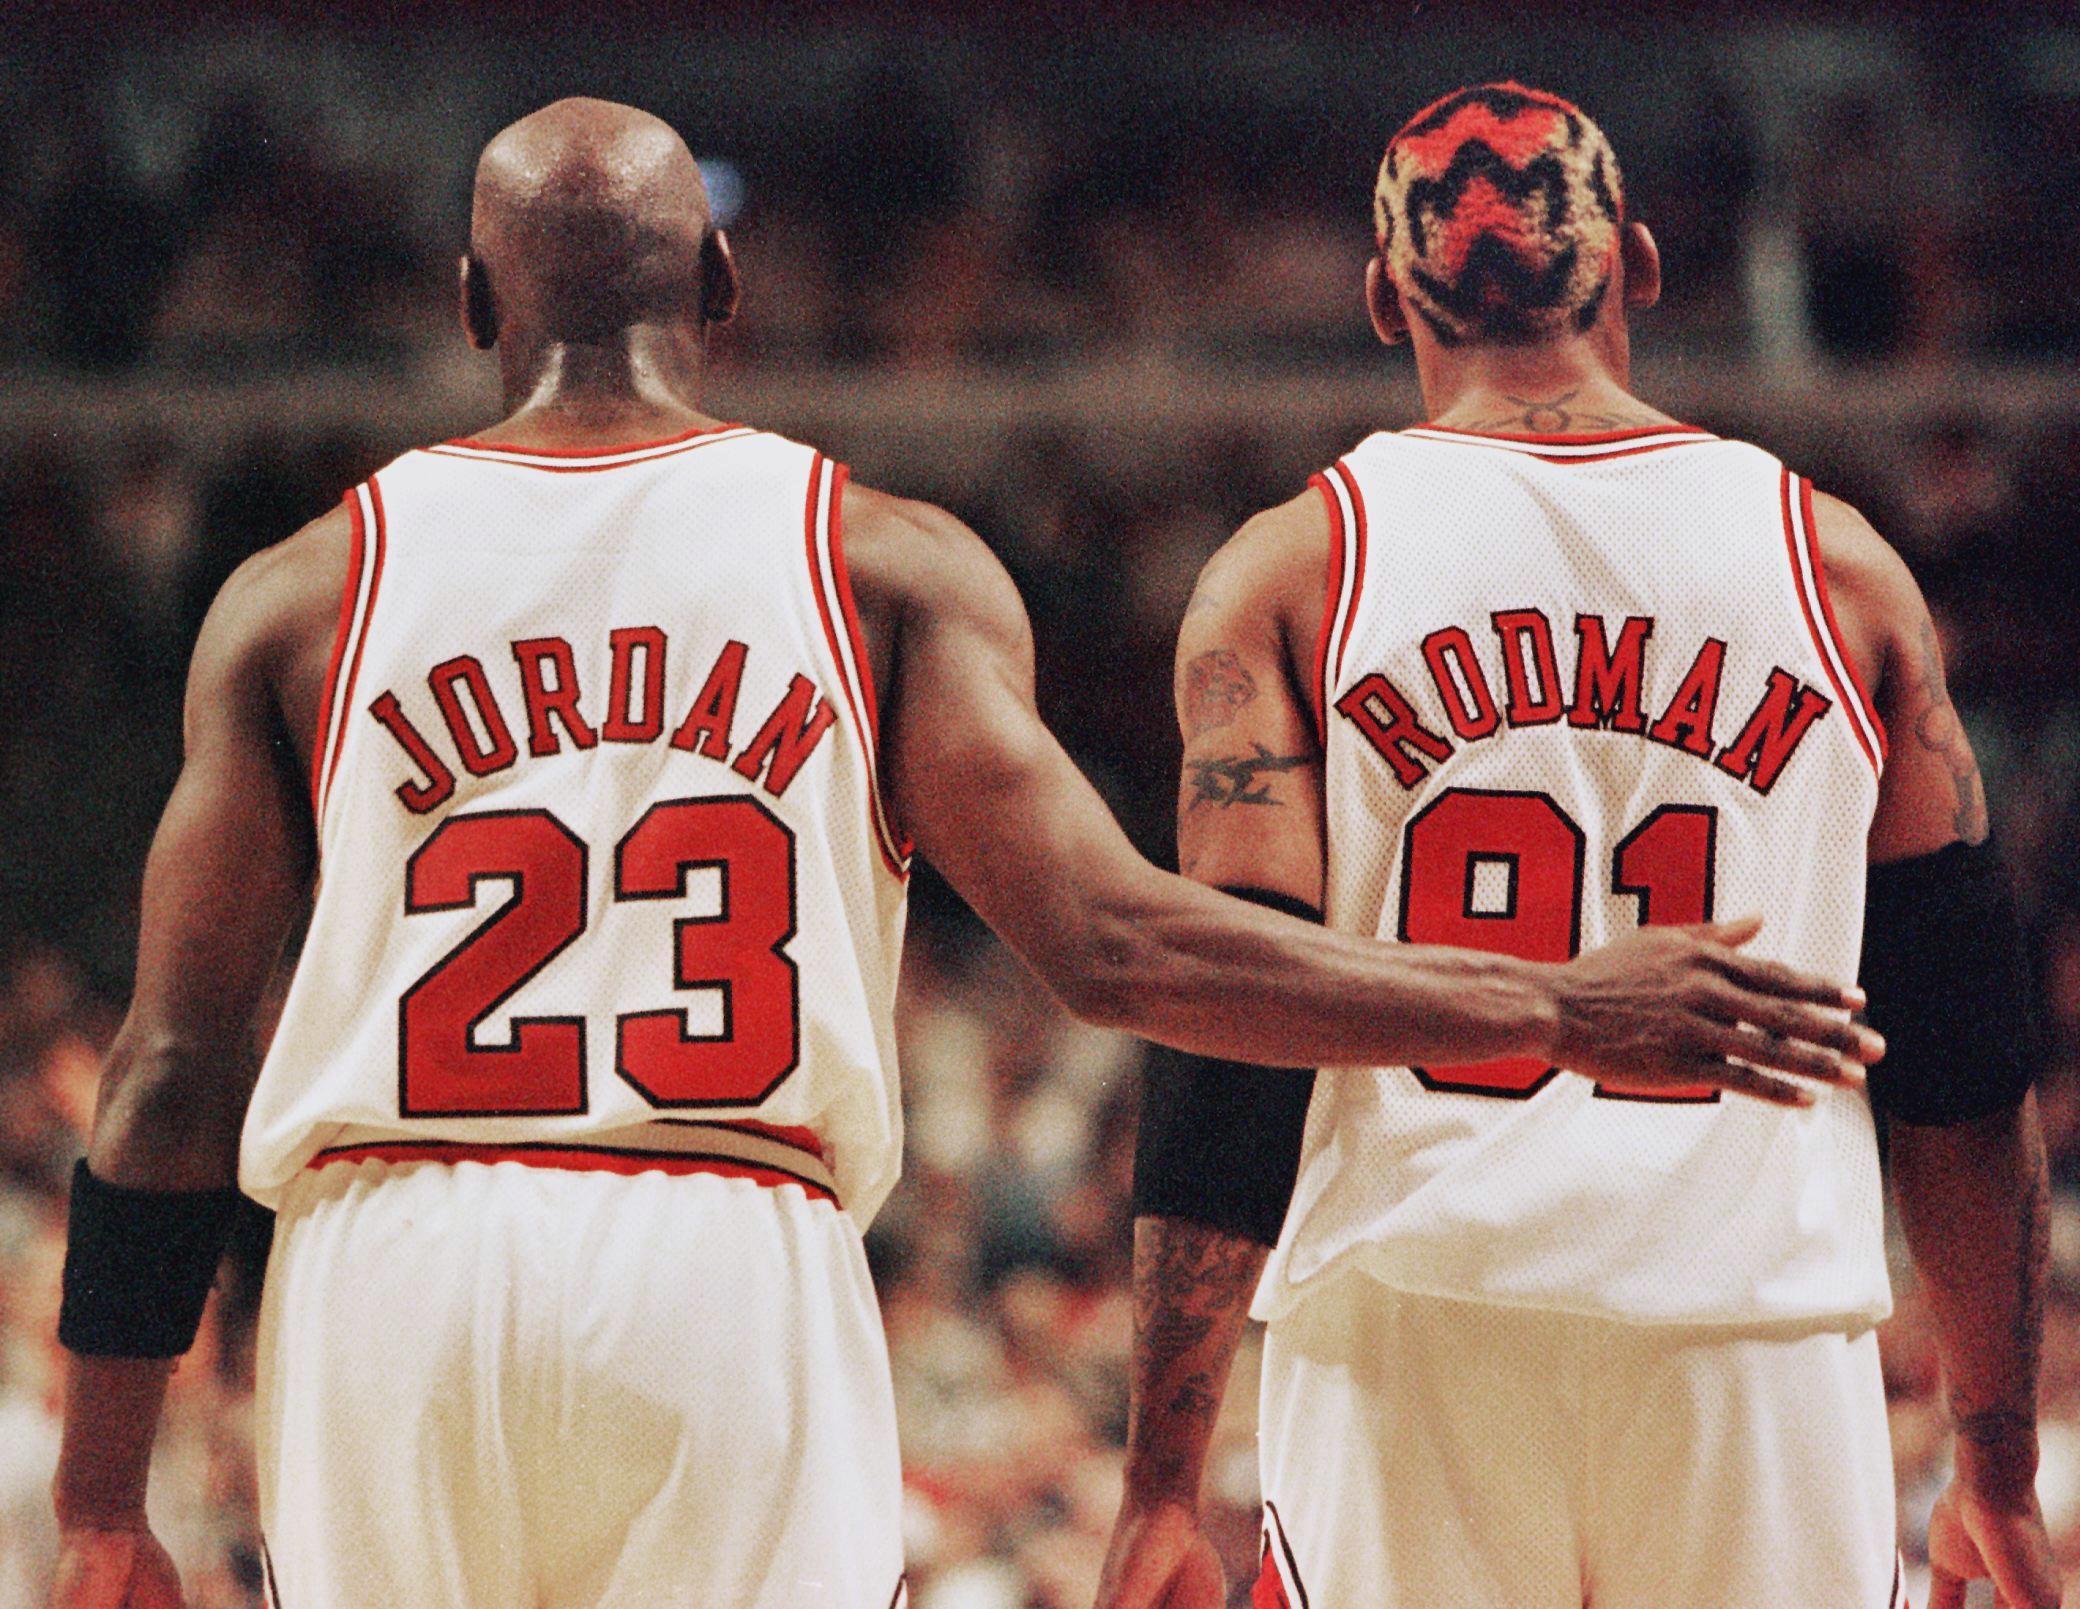 Dennis Rodman Defends Michael Jordan and 'The Last Dance' - Newsweek